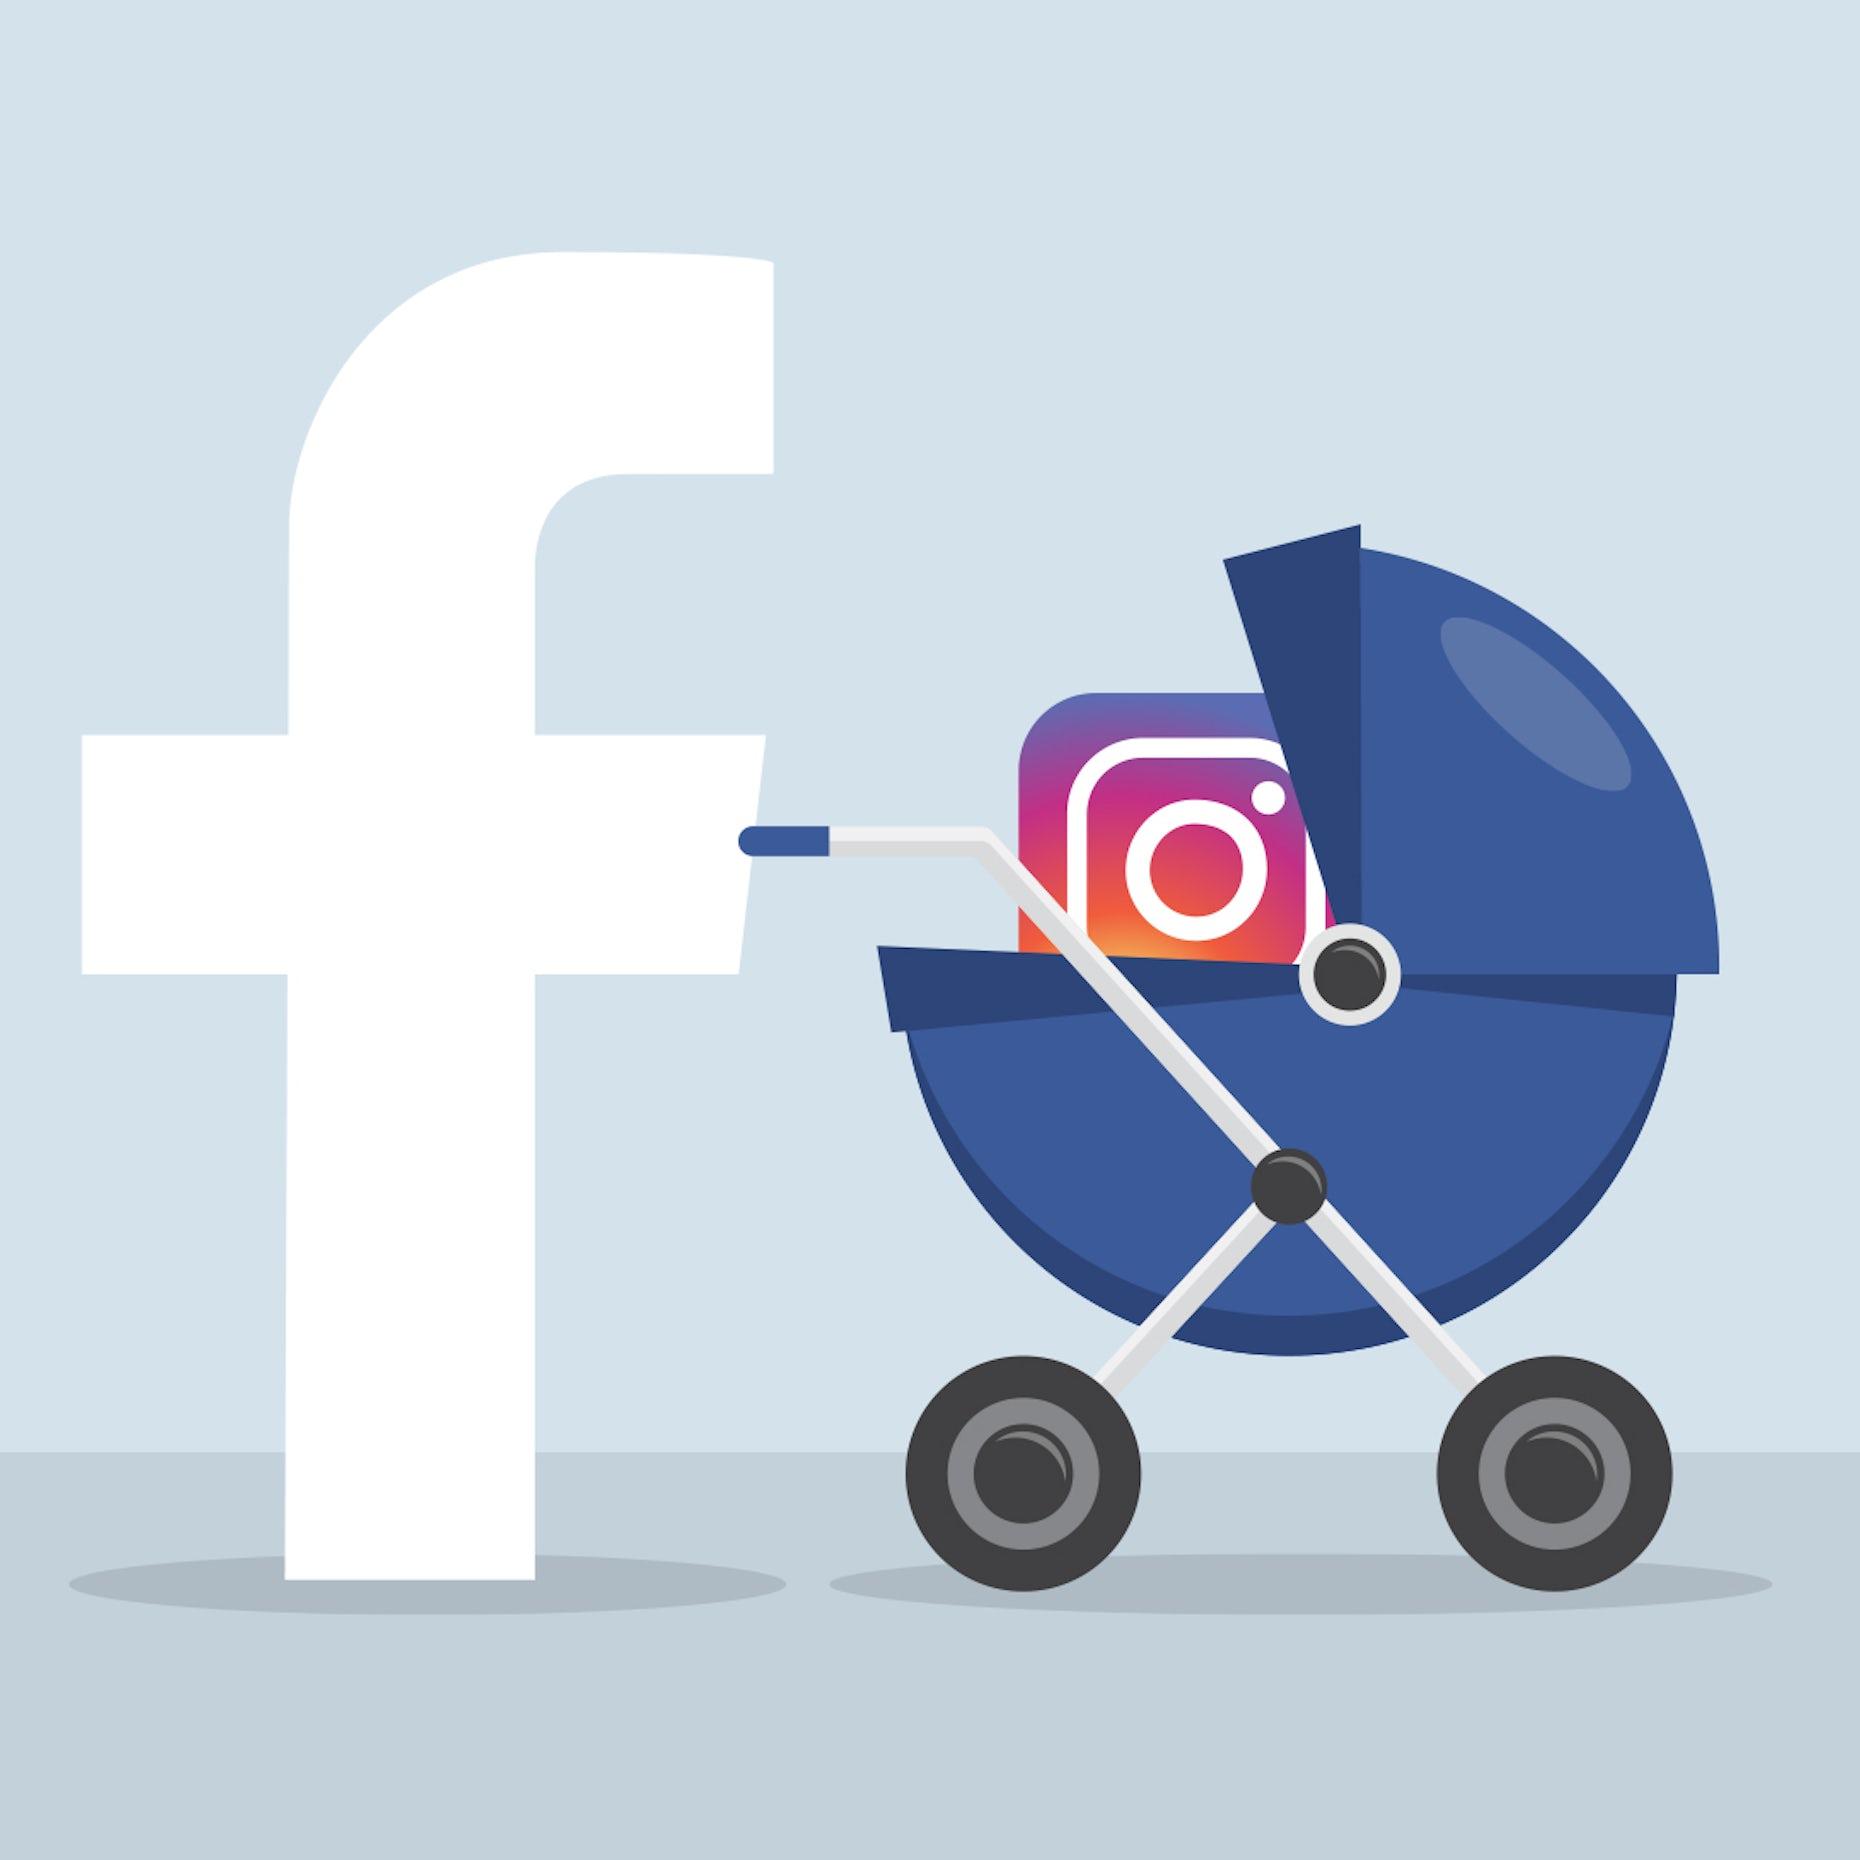 official photos bca2a 9cdd7 Instagram vs. facebook  what s the better marketing avenue  - 99designs